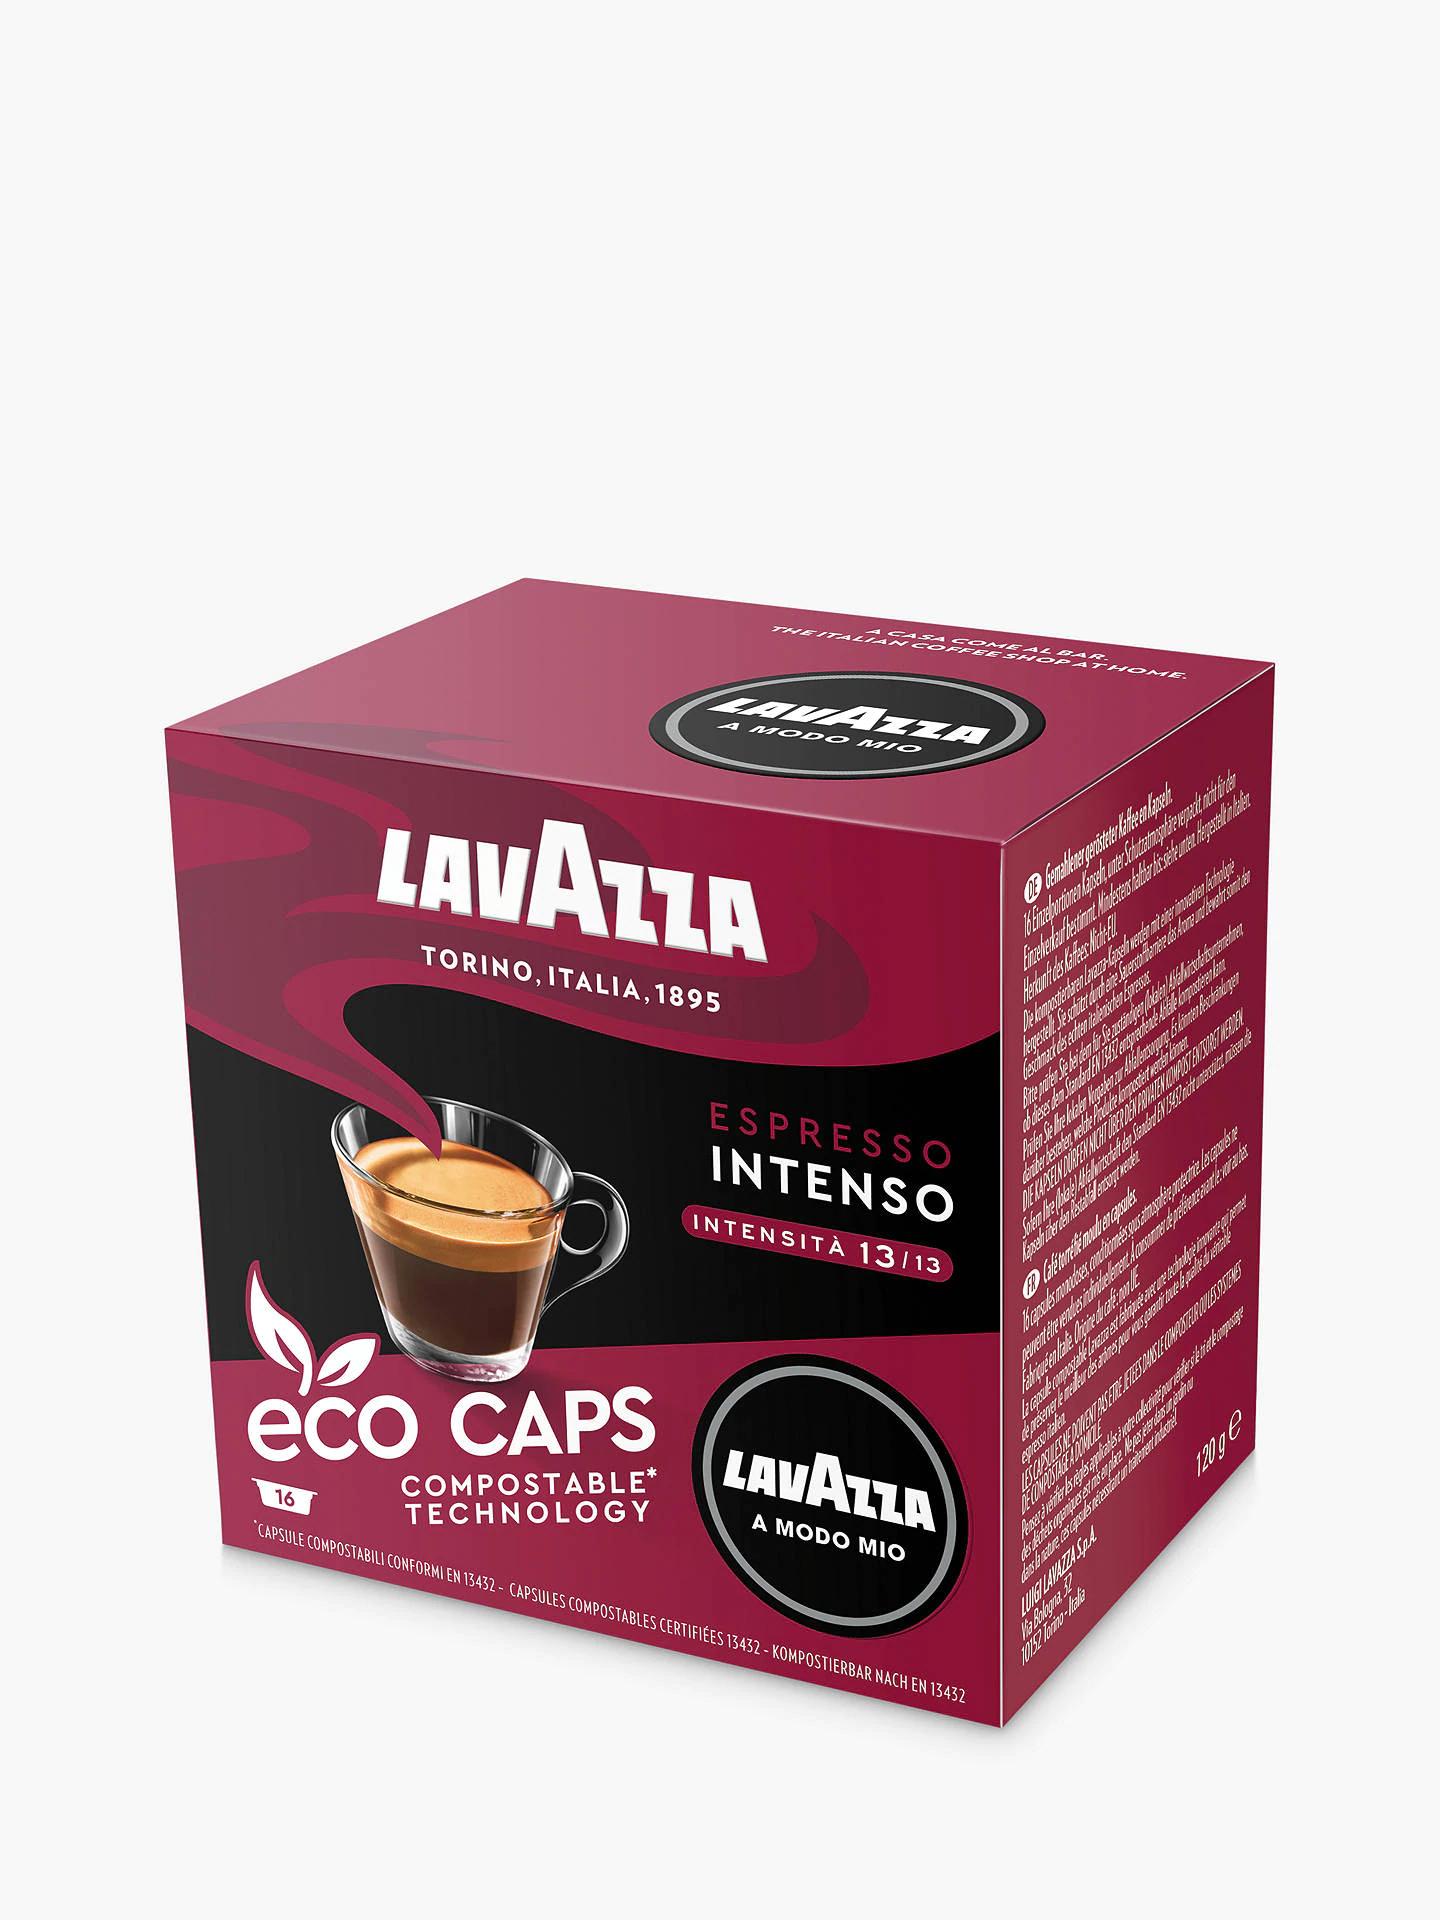 Lavazza Intenso A Modo Mio Espresso Eco Capsules, Pack of 16 £3.40 @ John Lewis & Partners